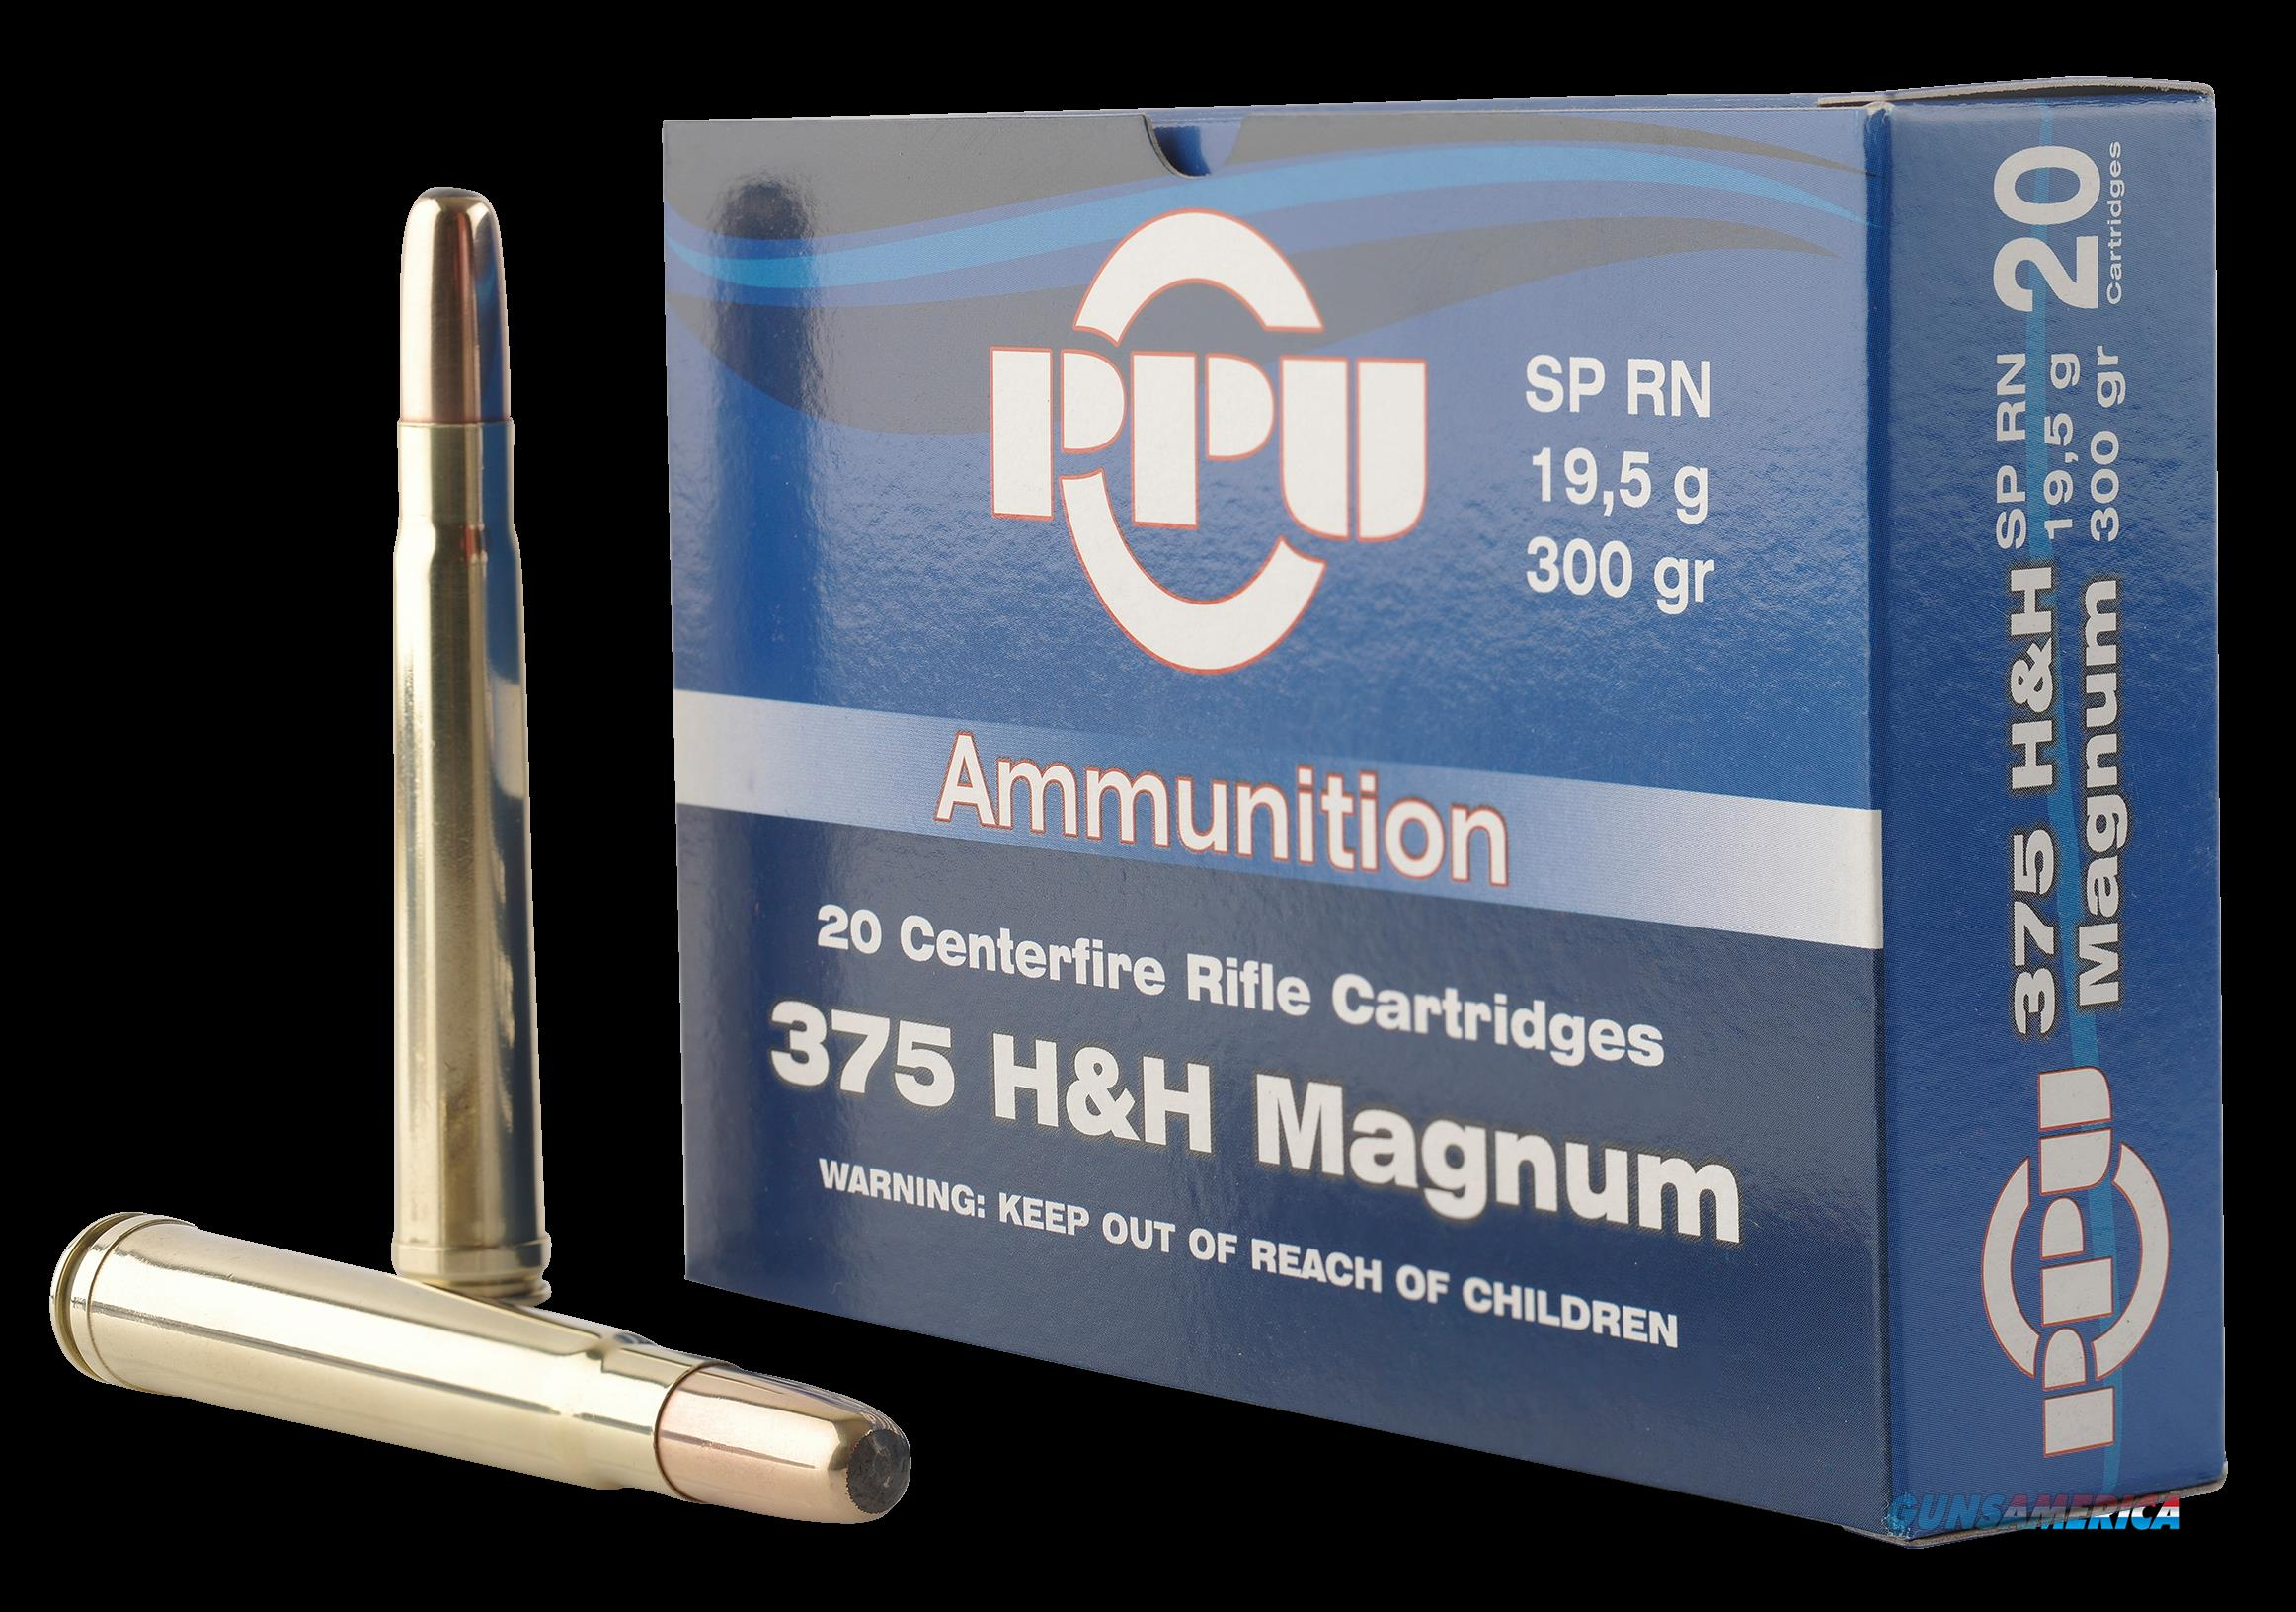 Ppu Standard Rifle, Ppu Pp375s      375 H&h     300 Sprn         10-20  Guns > Pistols > 1911 Pistol Copies (non-Colt)